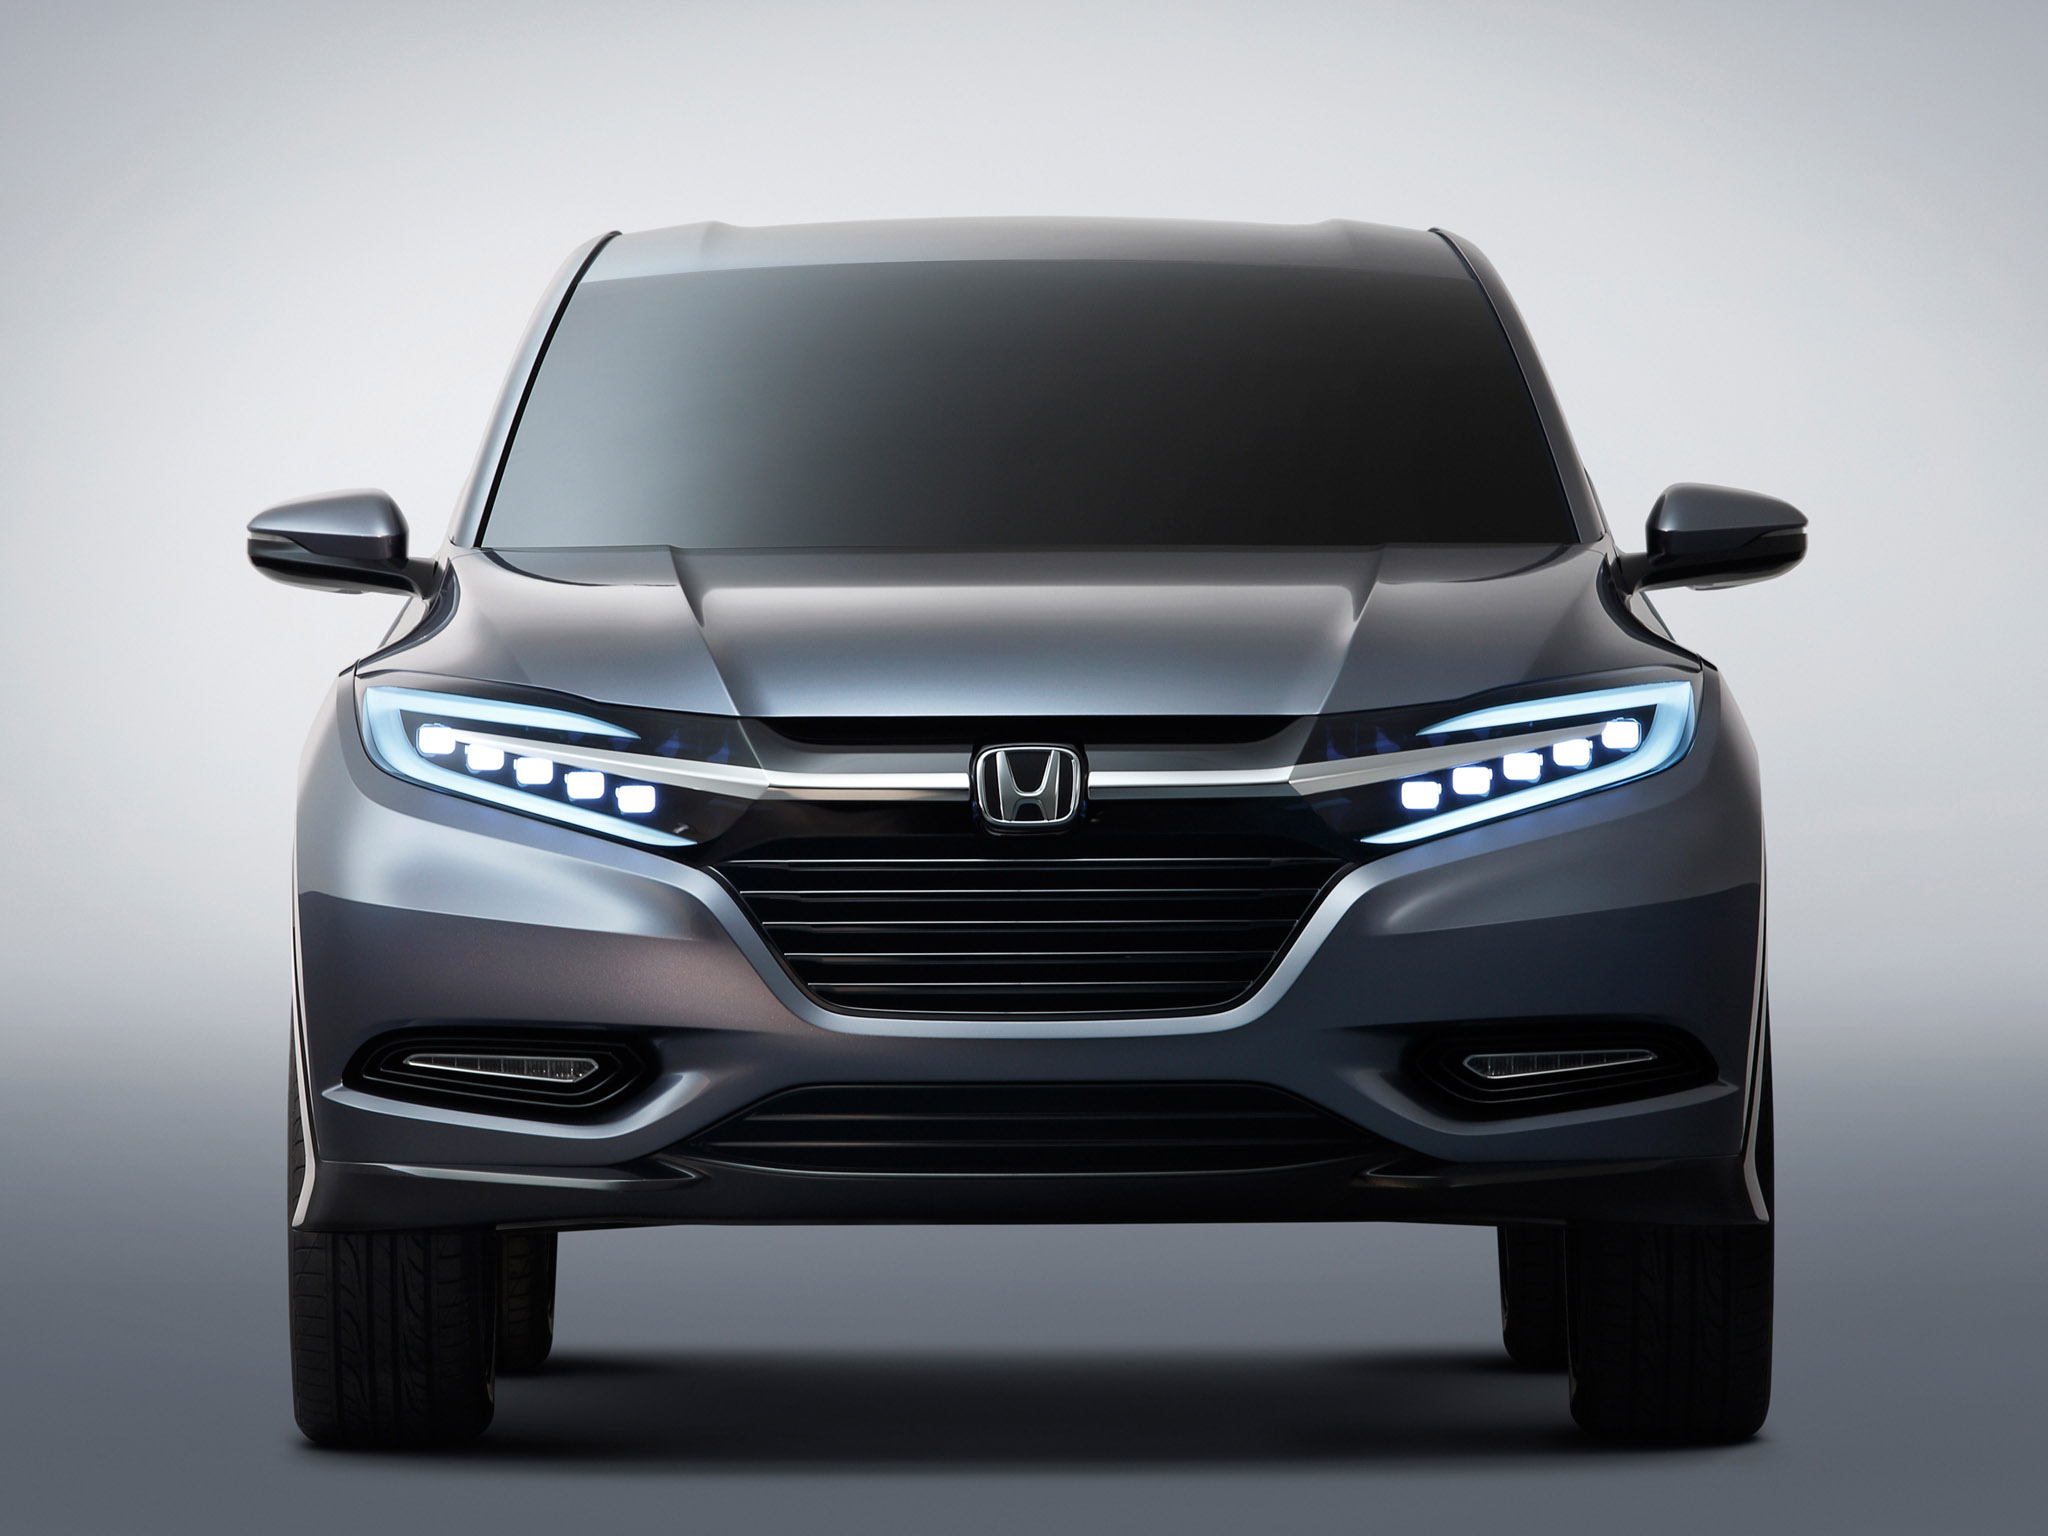 Honda Urban SUV Concept photo #1